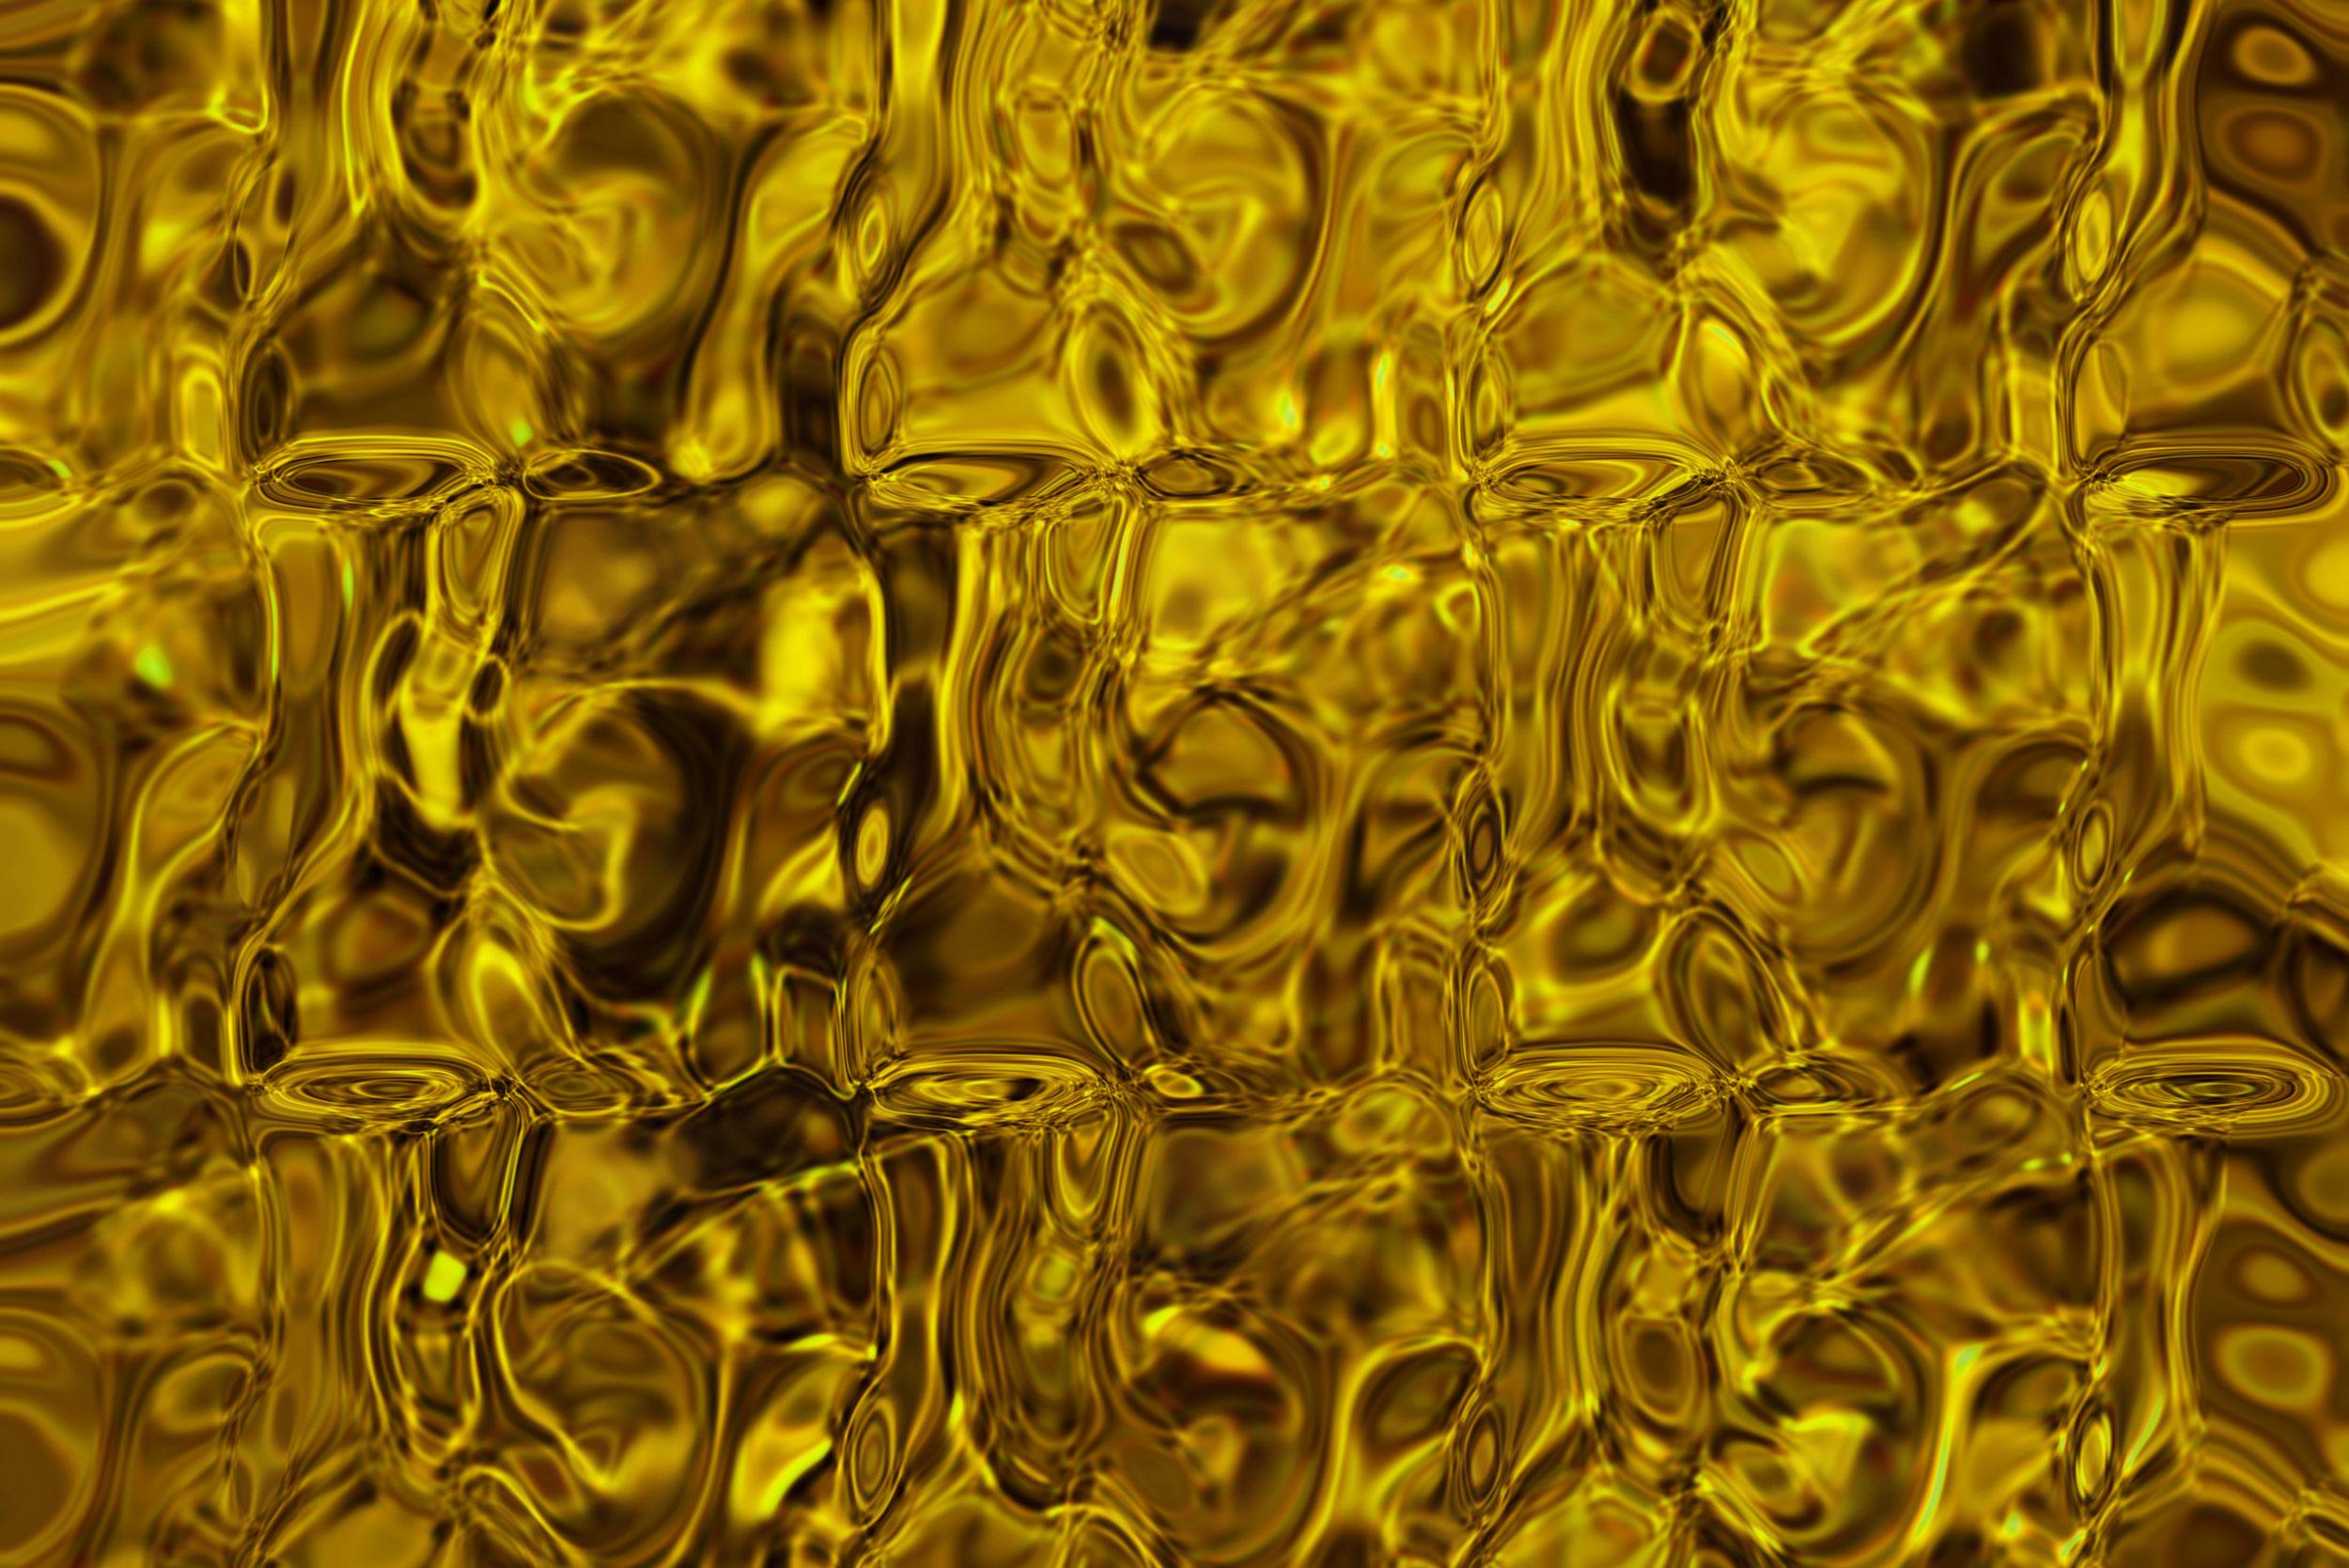 Картинка золотая текстура для фотошопа желто - янтарного цвета